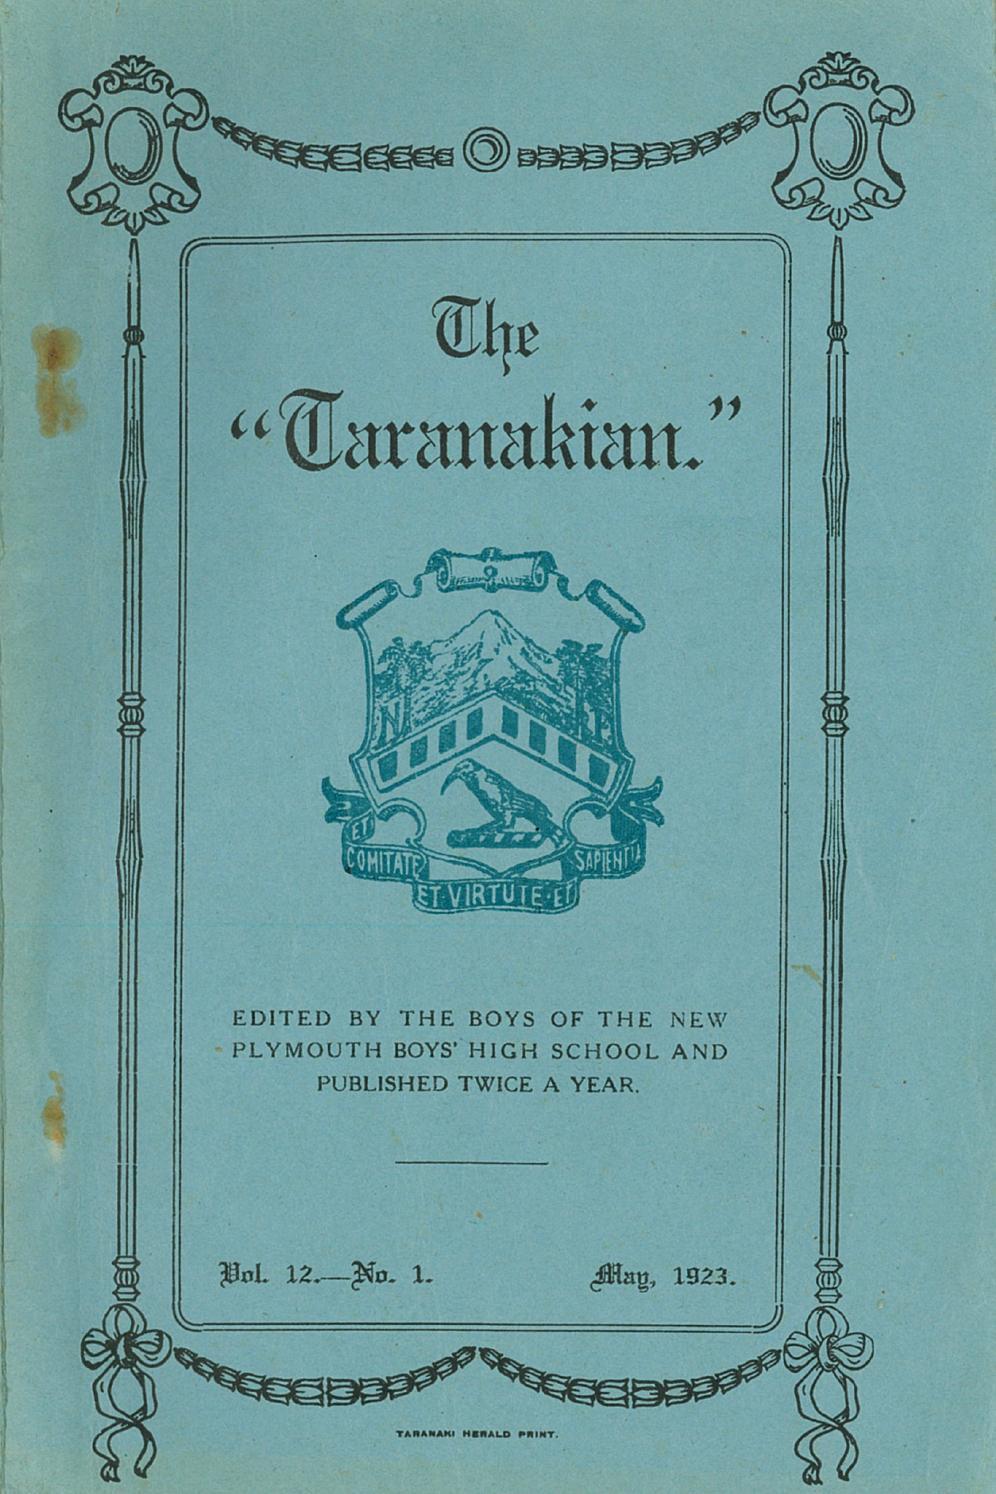 medium resolution of 1923 the taranakian vol 12 no 1 may